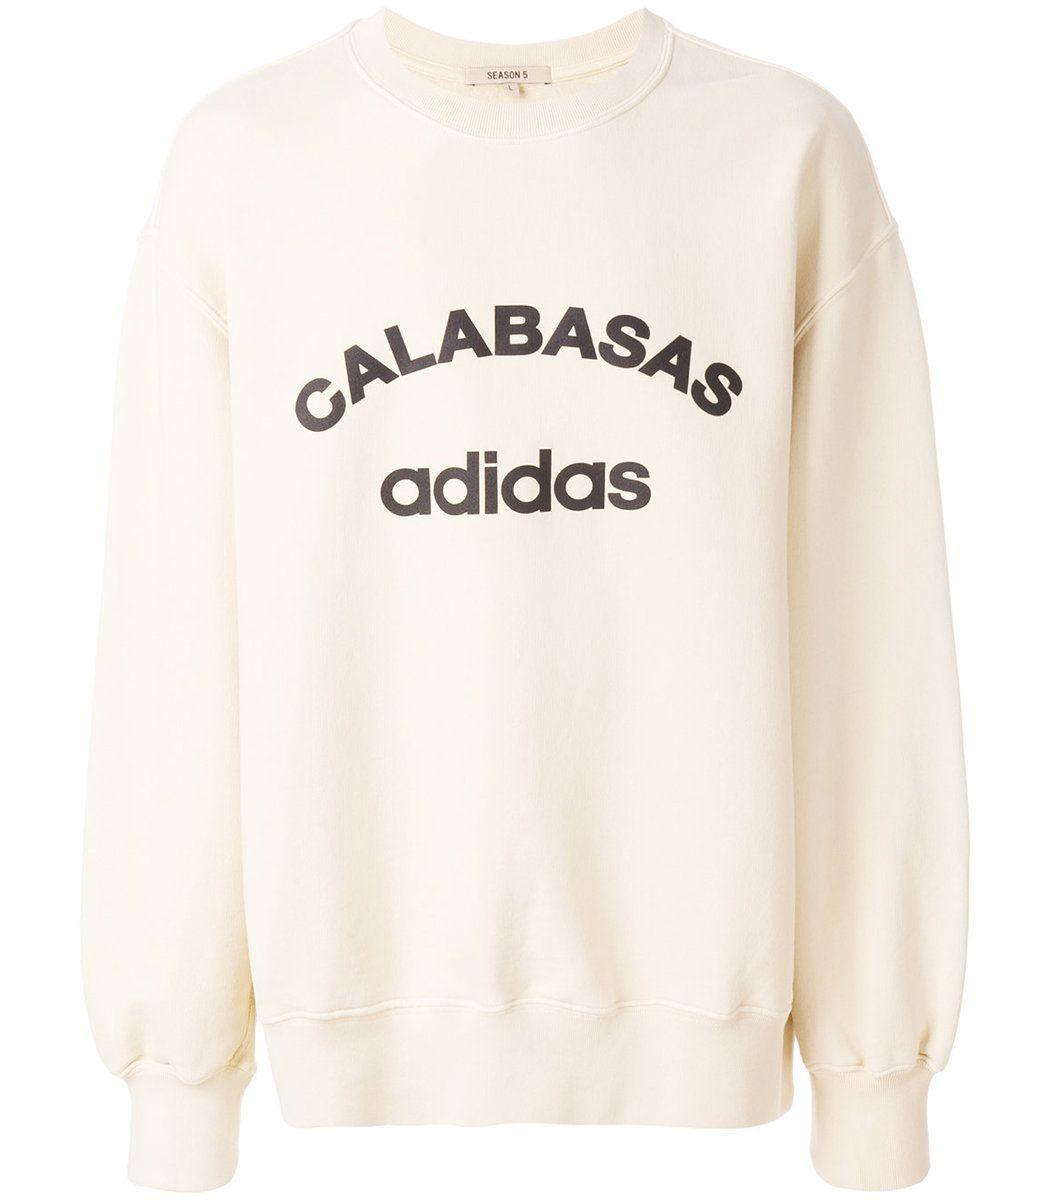 Yeezy White Calabasas Crew Neck Sweatshirt Modesens Sweatshirts Crew Neck Sweatshirt White Sweatshirt [ 1200 x 1050 Pixel ]